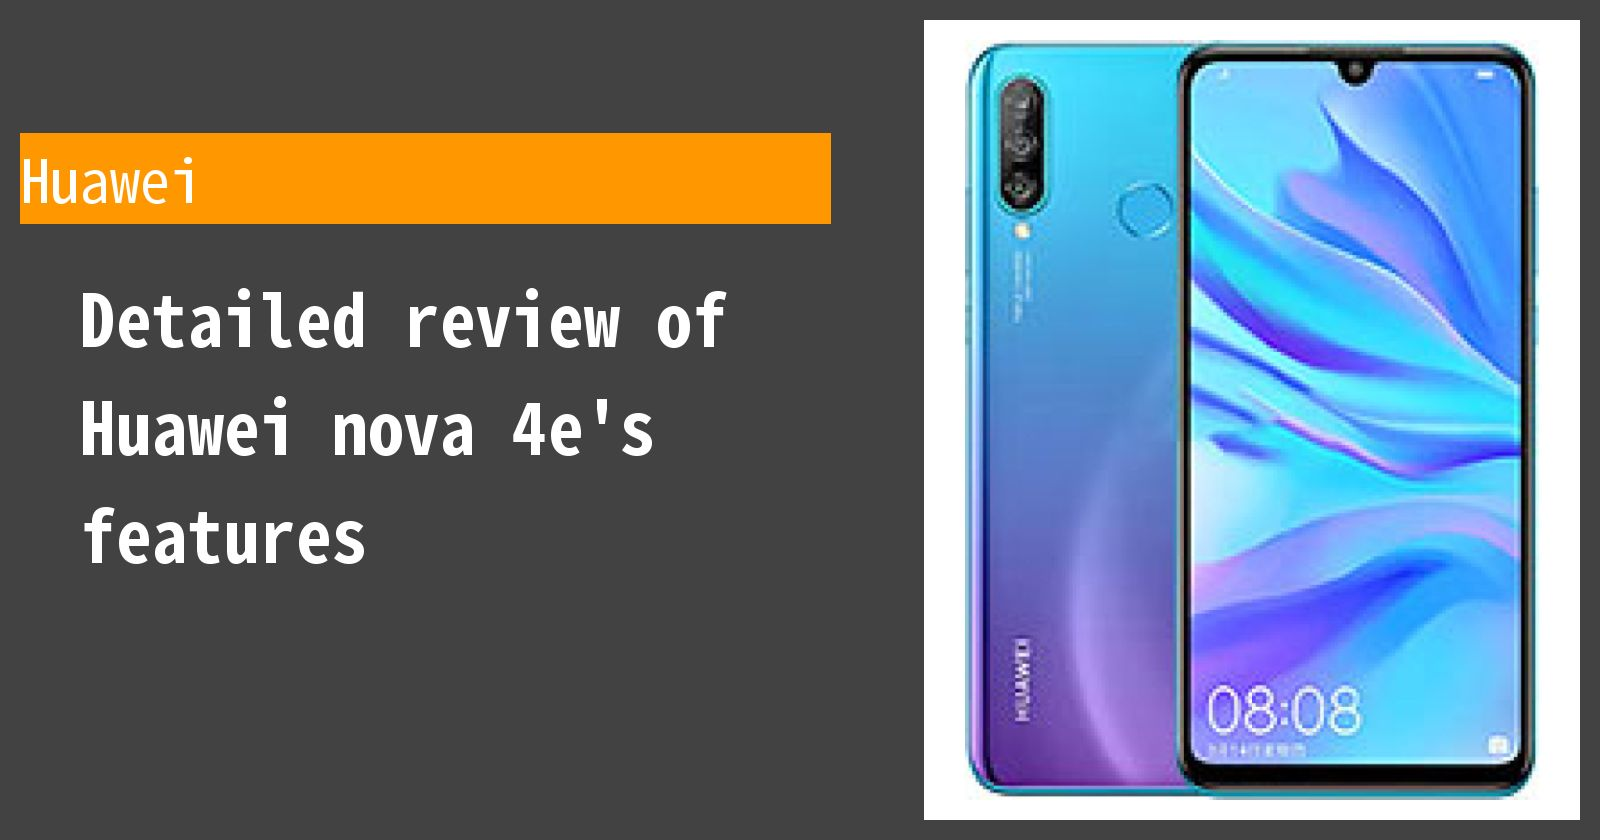 Detailed review of Huawei nova 4e's features